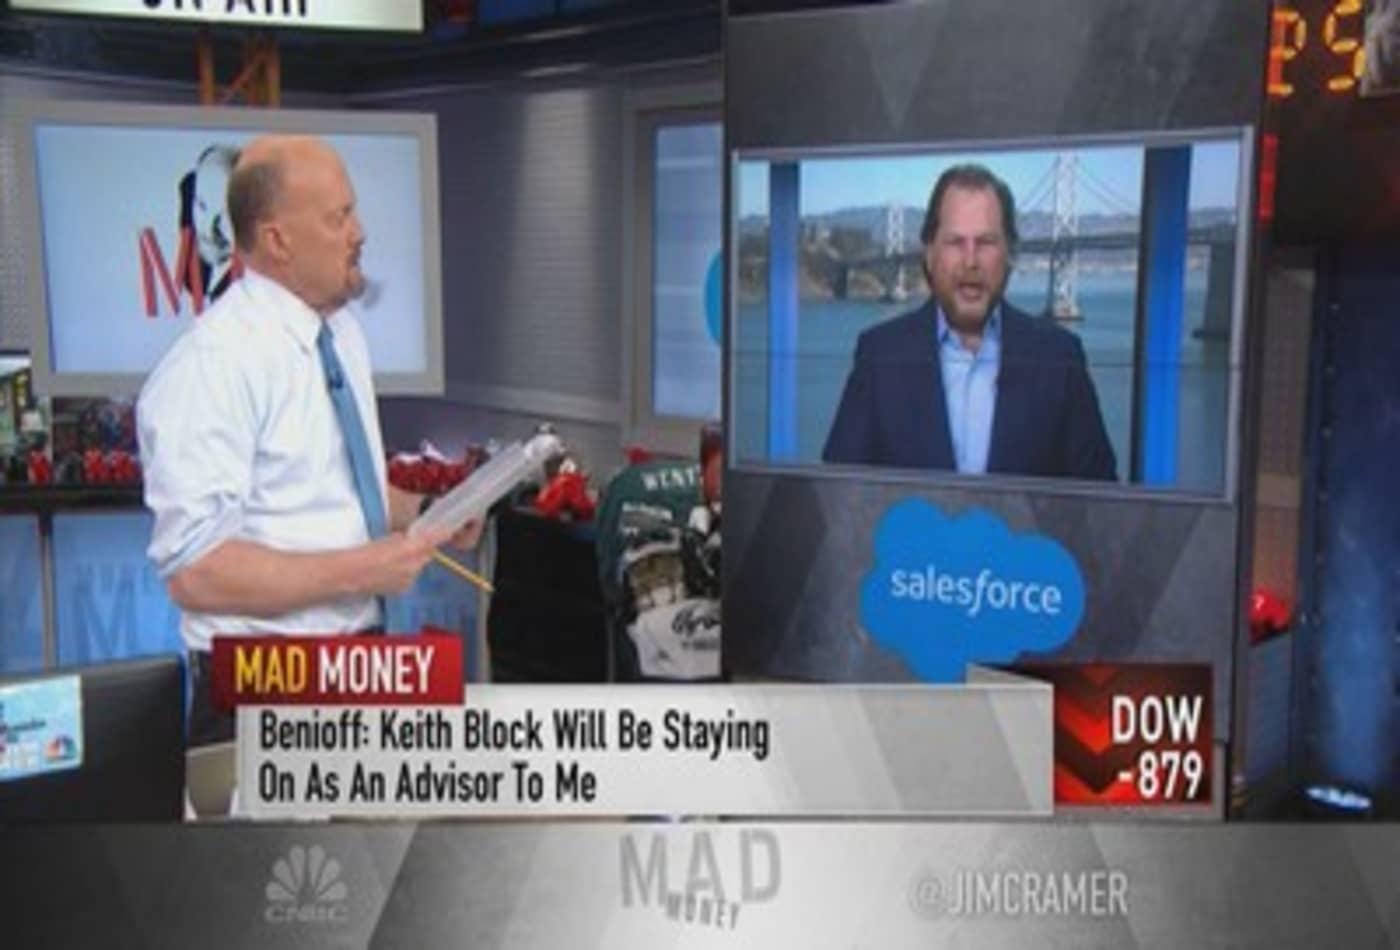 Salesforce's Marc Benioff talks Q4 earnings, Keith Block's departure